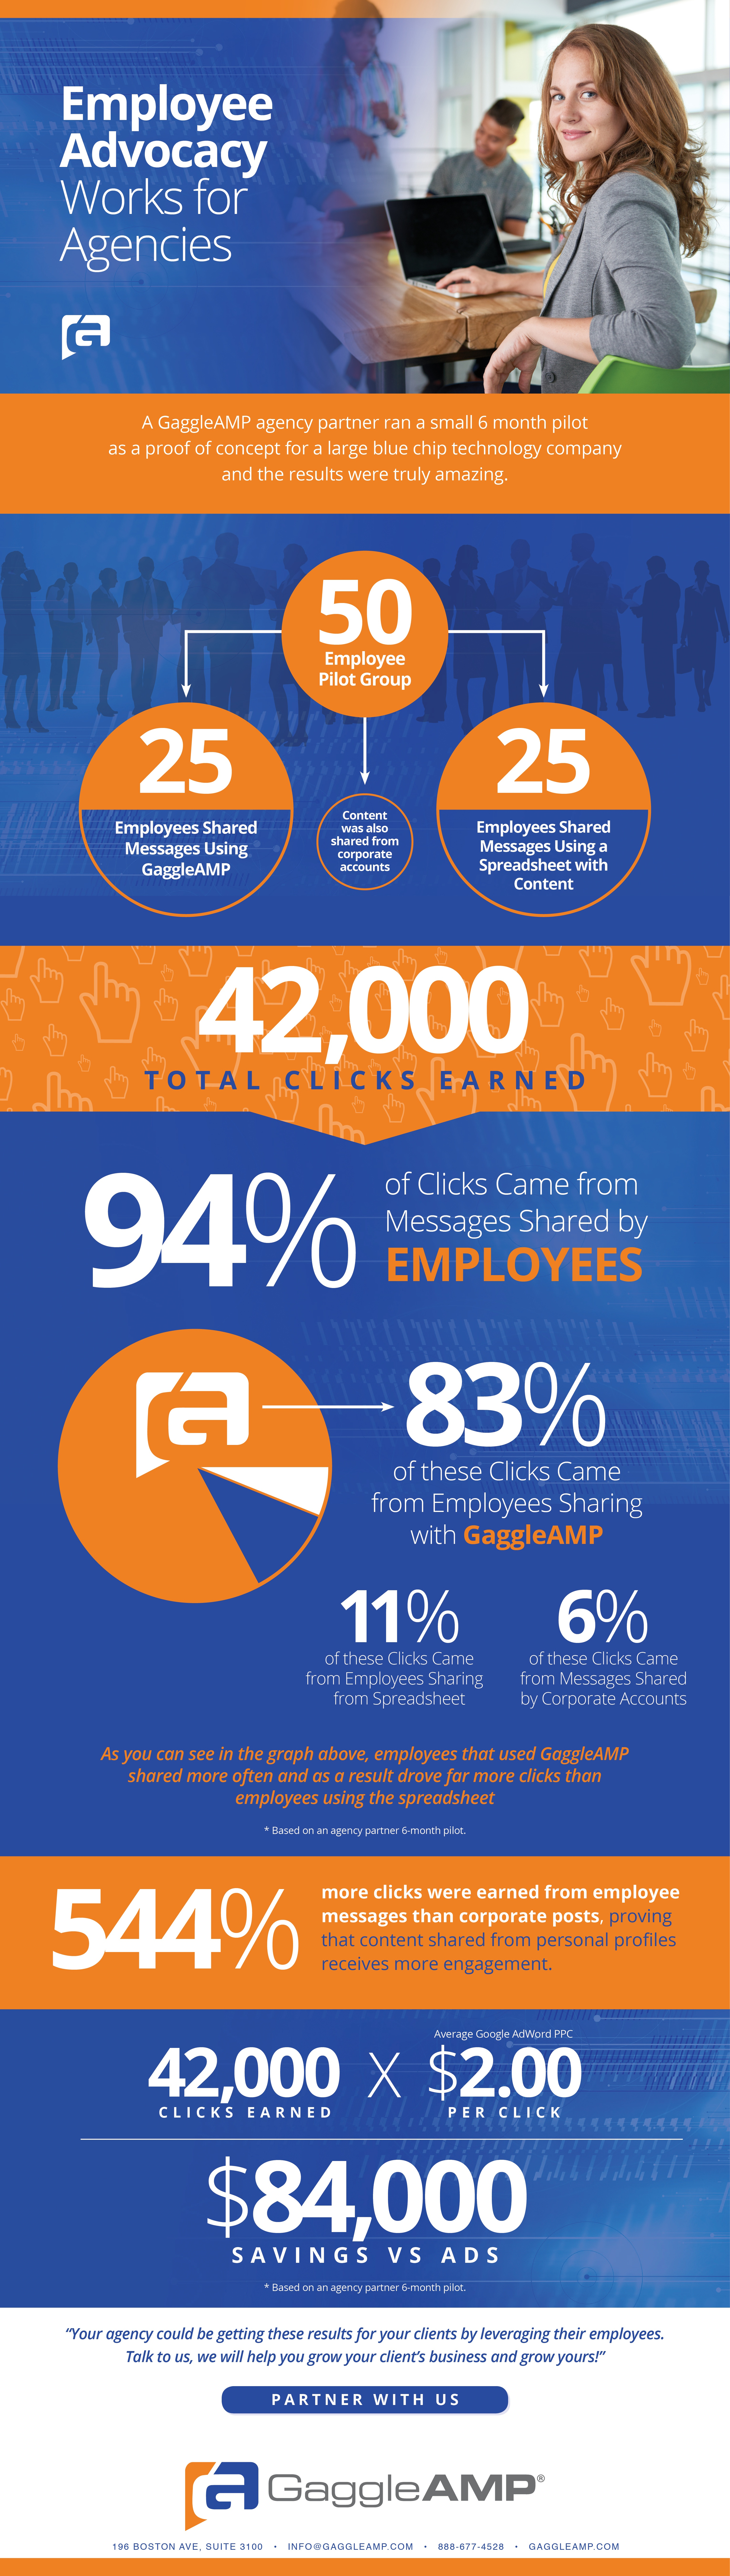 IMG-1689 GaggleAMP_Infographic_EmployeeAdvocacy.jpg